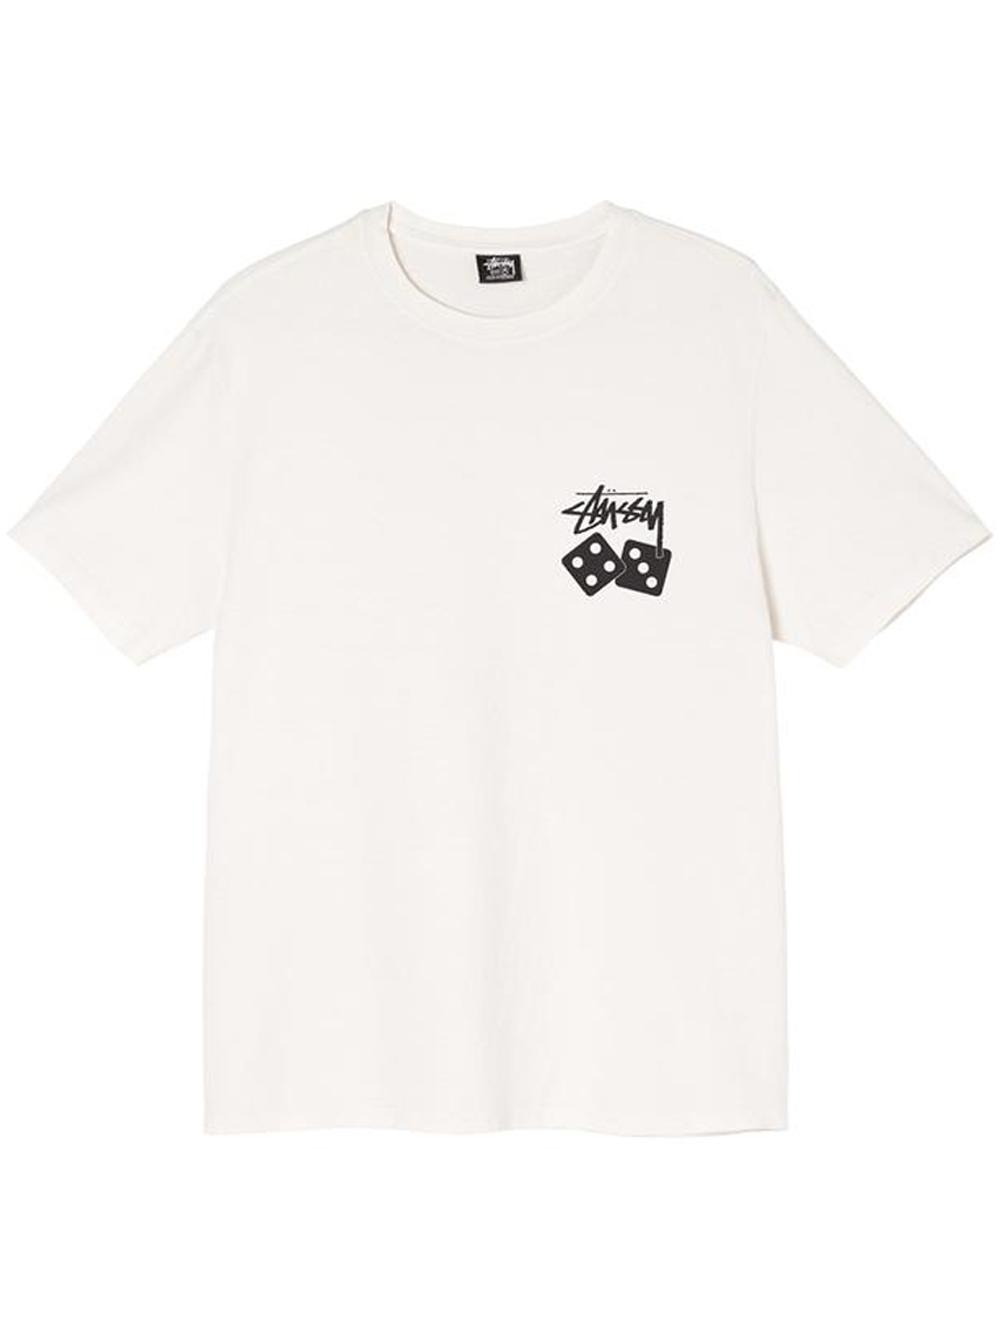 t-shirt dice pig dyed uomo natural in cotone STUSSY | T-shirt | 1904721NATURAL